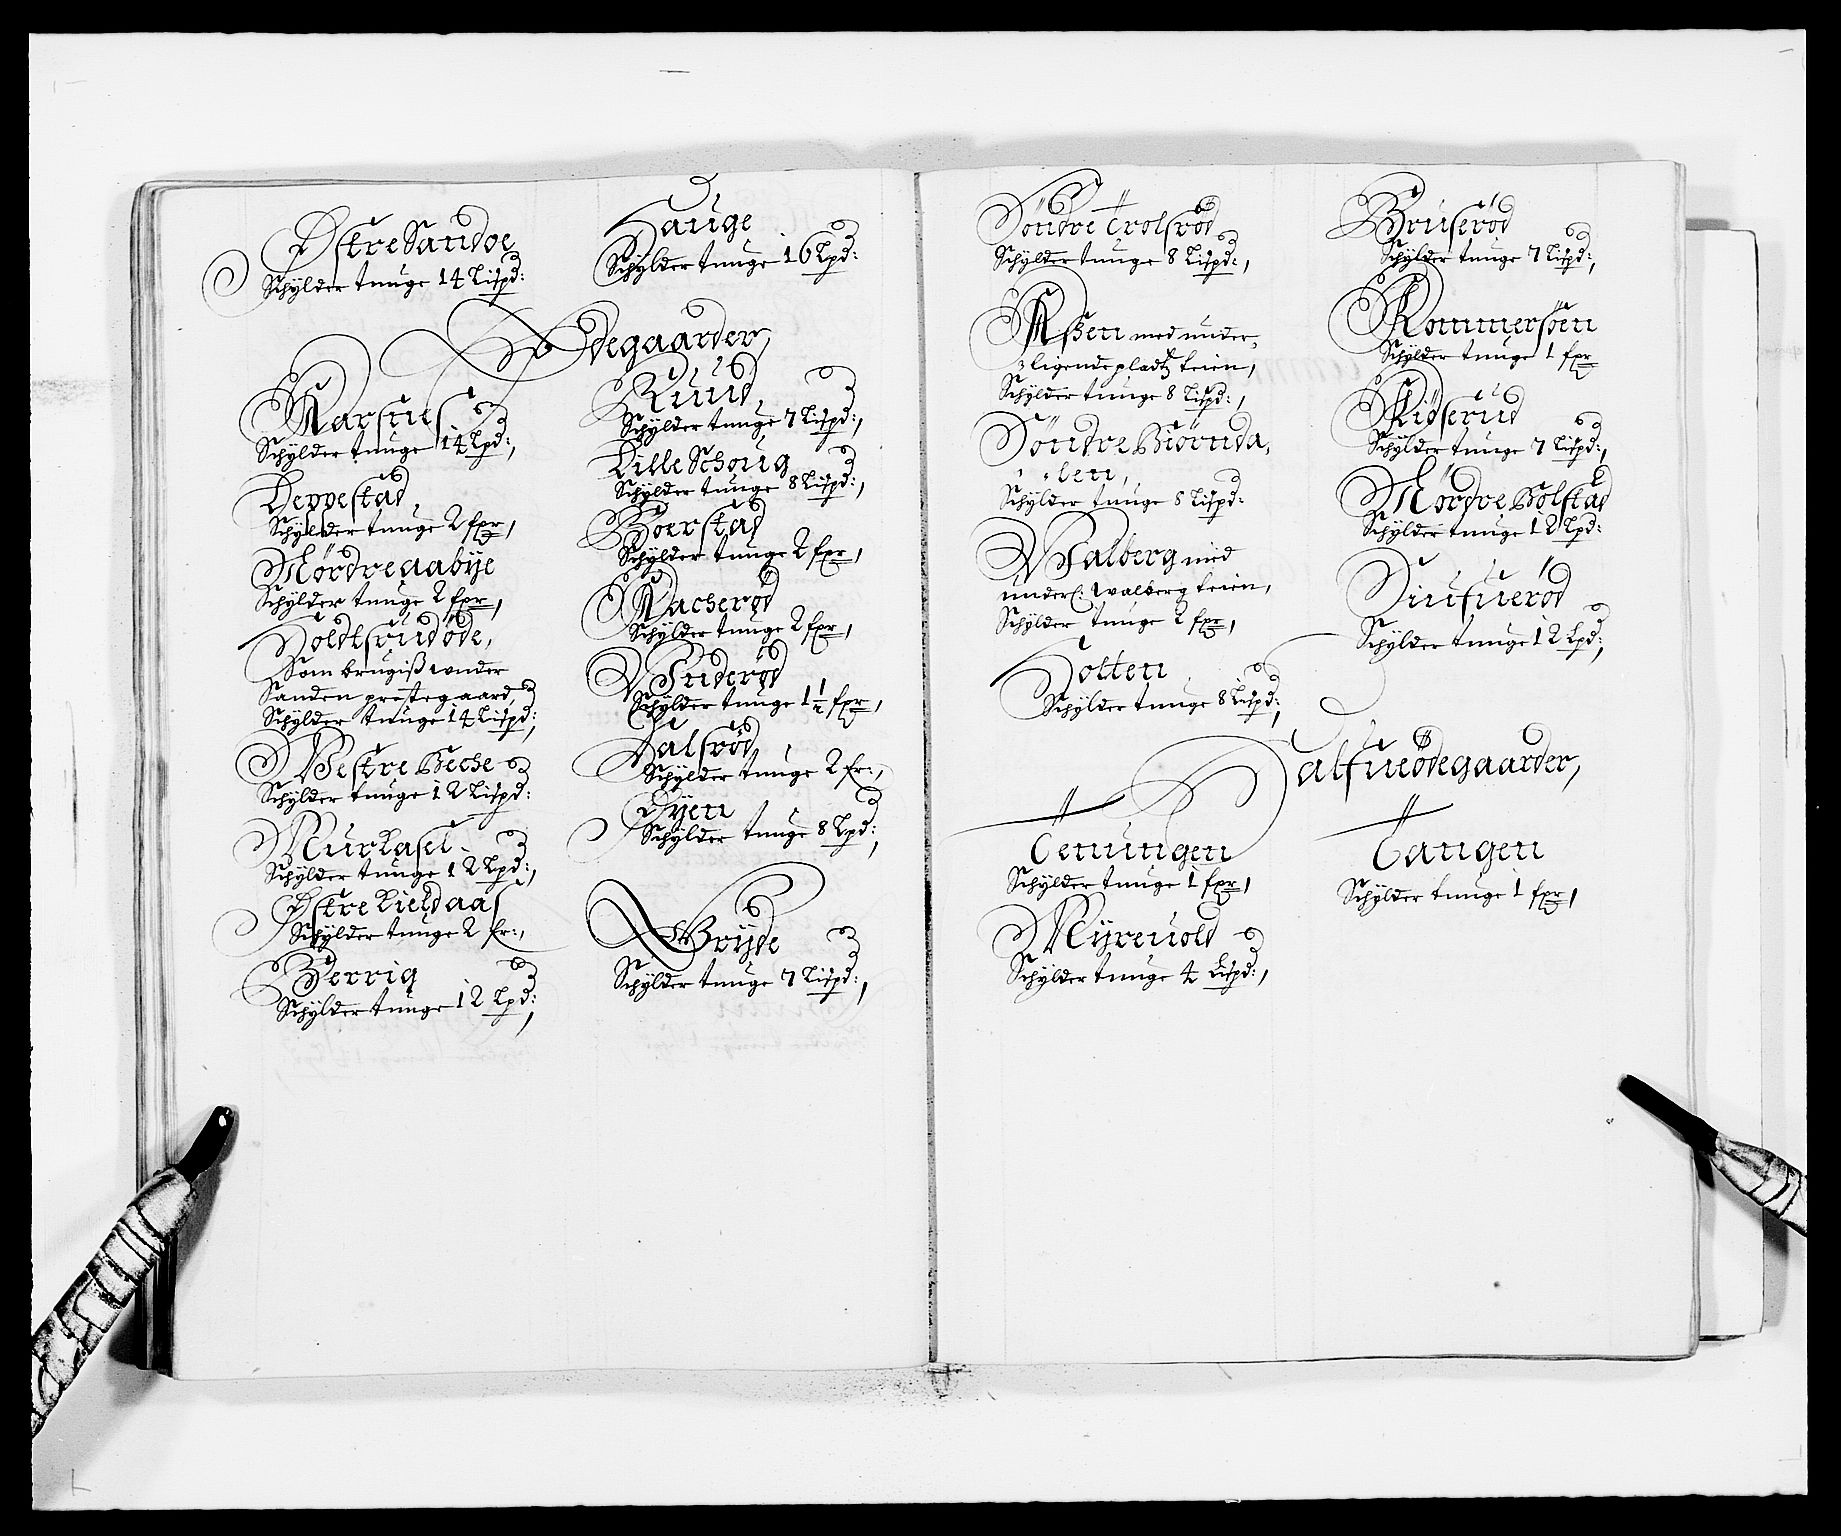 RA, Rentekammeret inntil 1814, Reviderte regnskaper, Fogderegnskap, R32/L1857: Fogderegnskap Jarlsberg grevskap, 1686-1690, s. 475